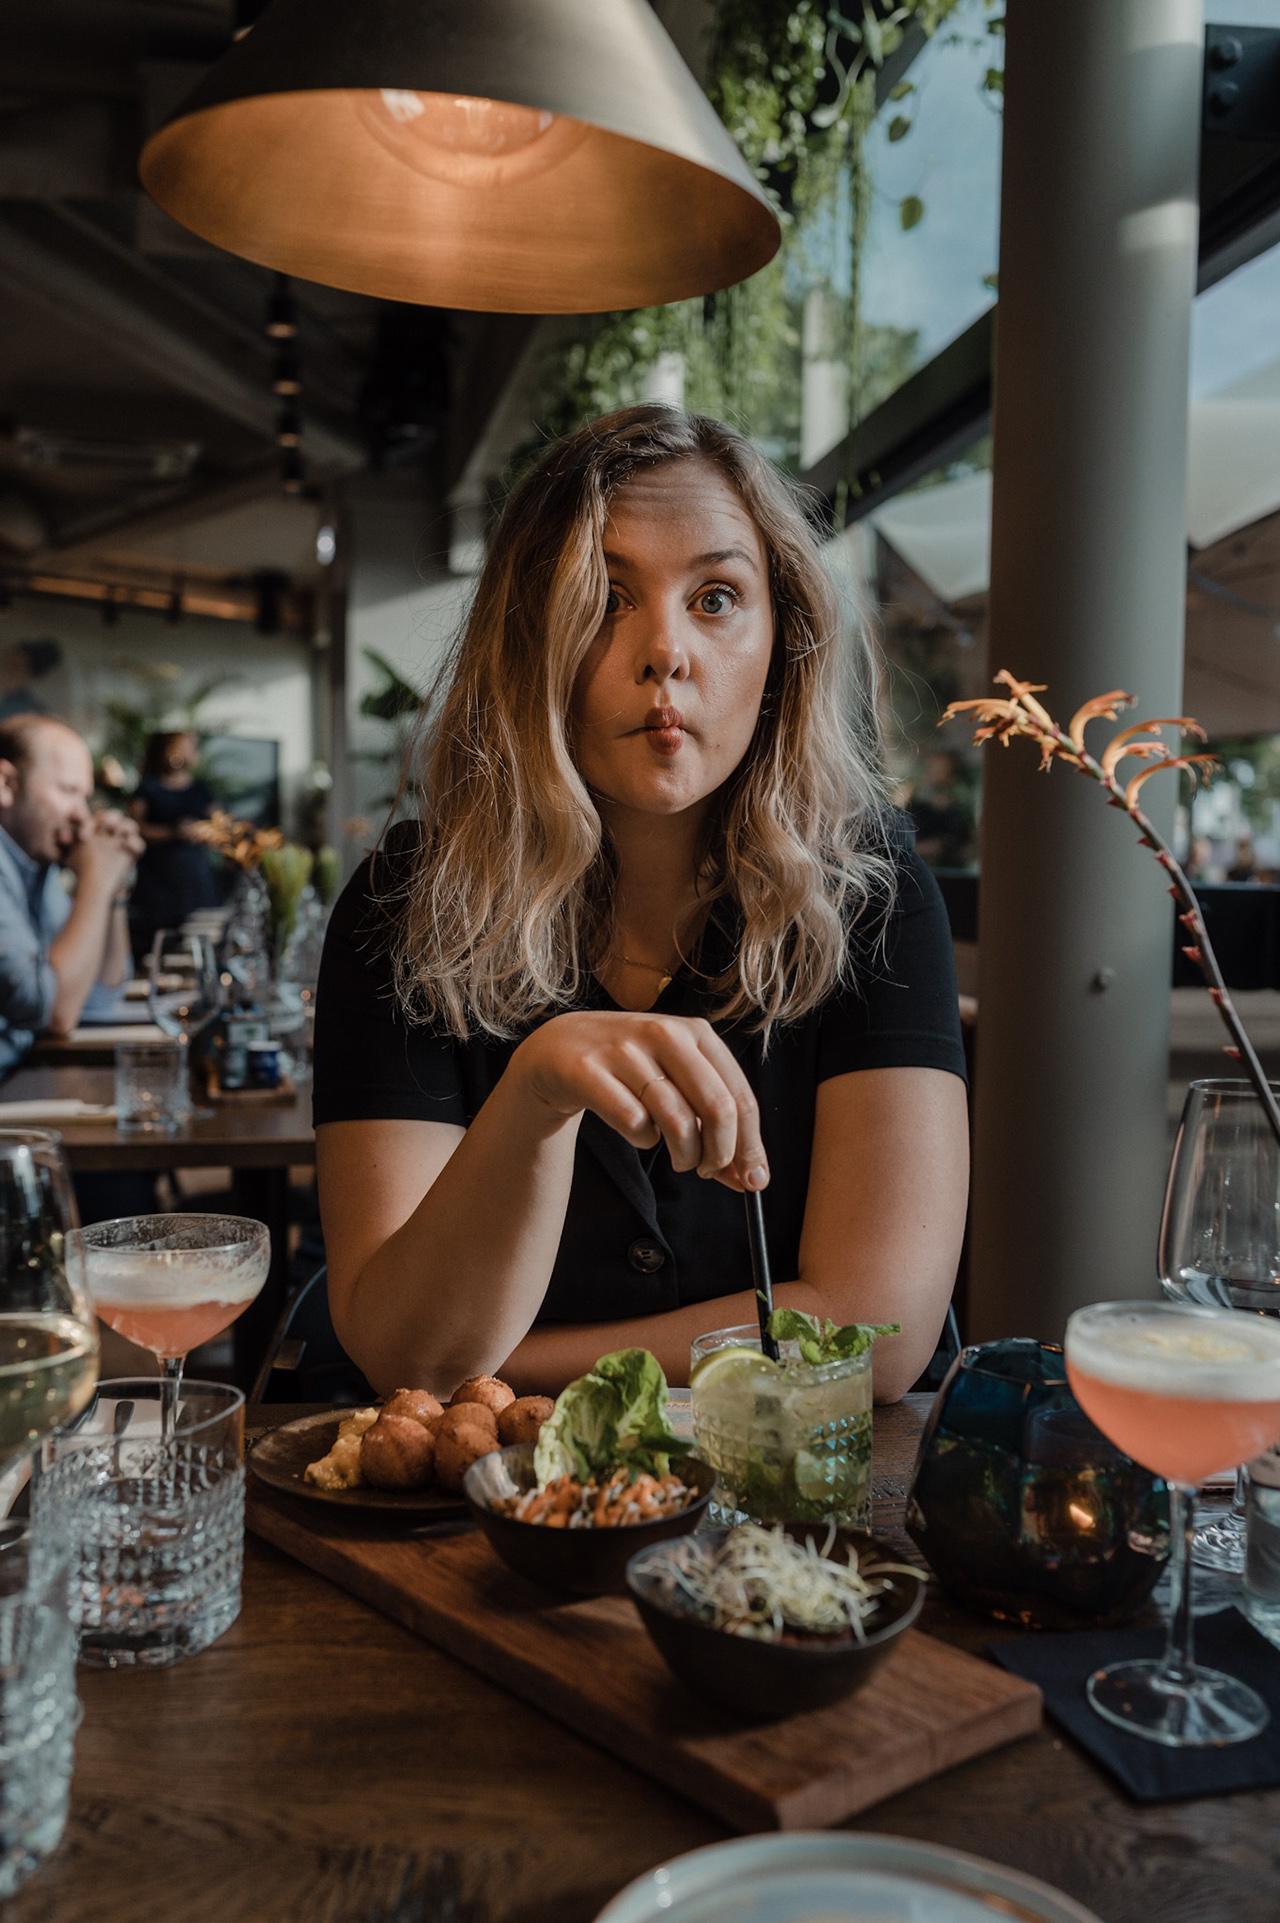 noon-maastricht-interior-restaurant-sarahwitpeerd-eating